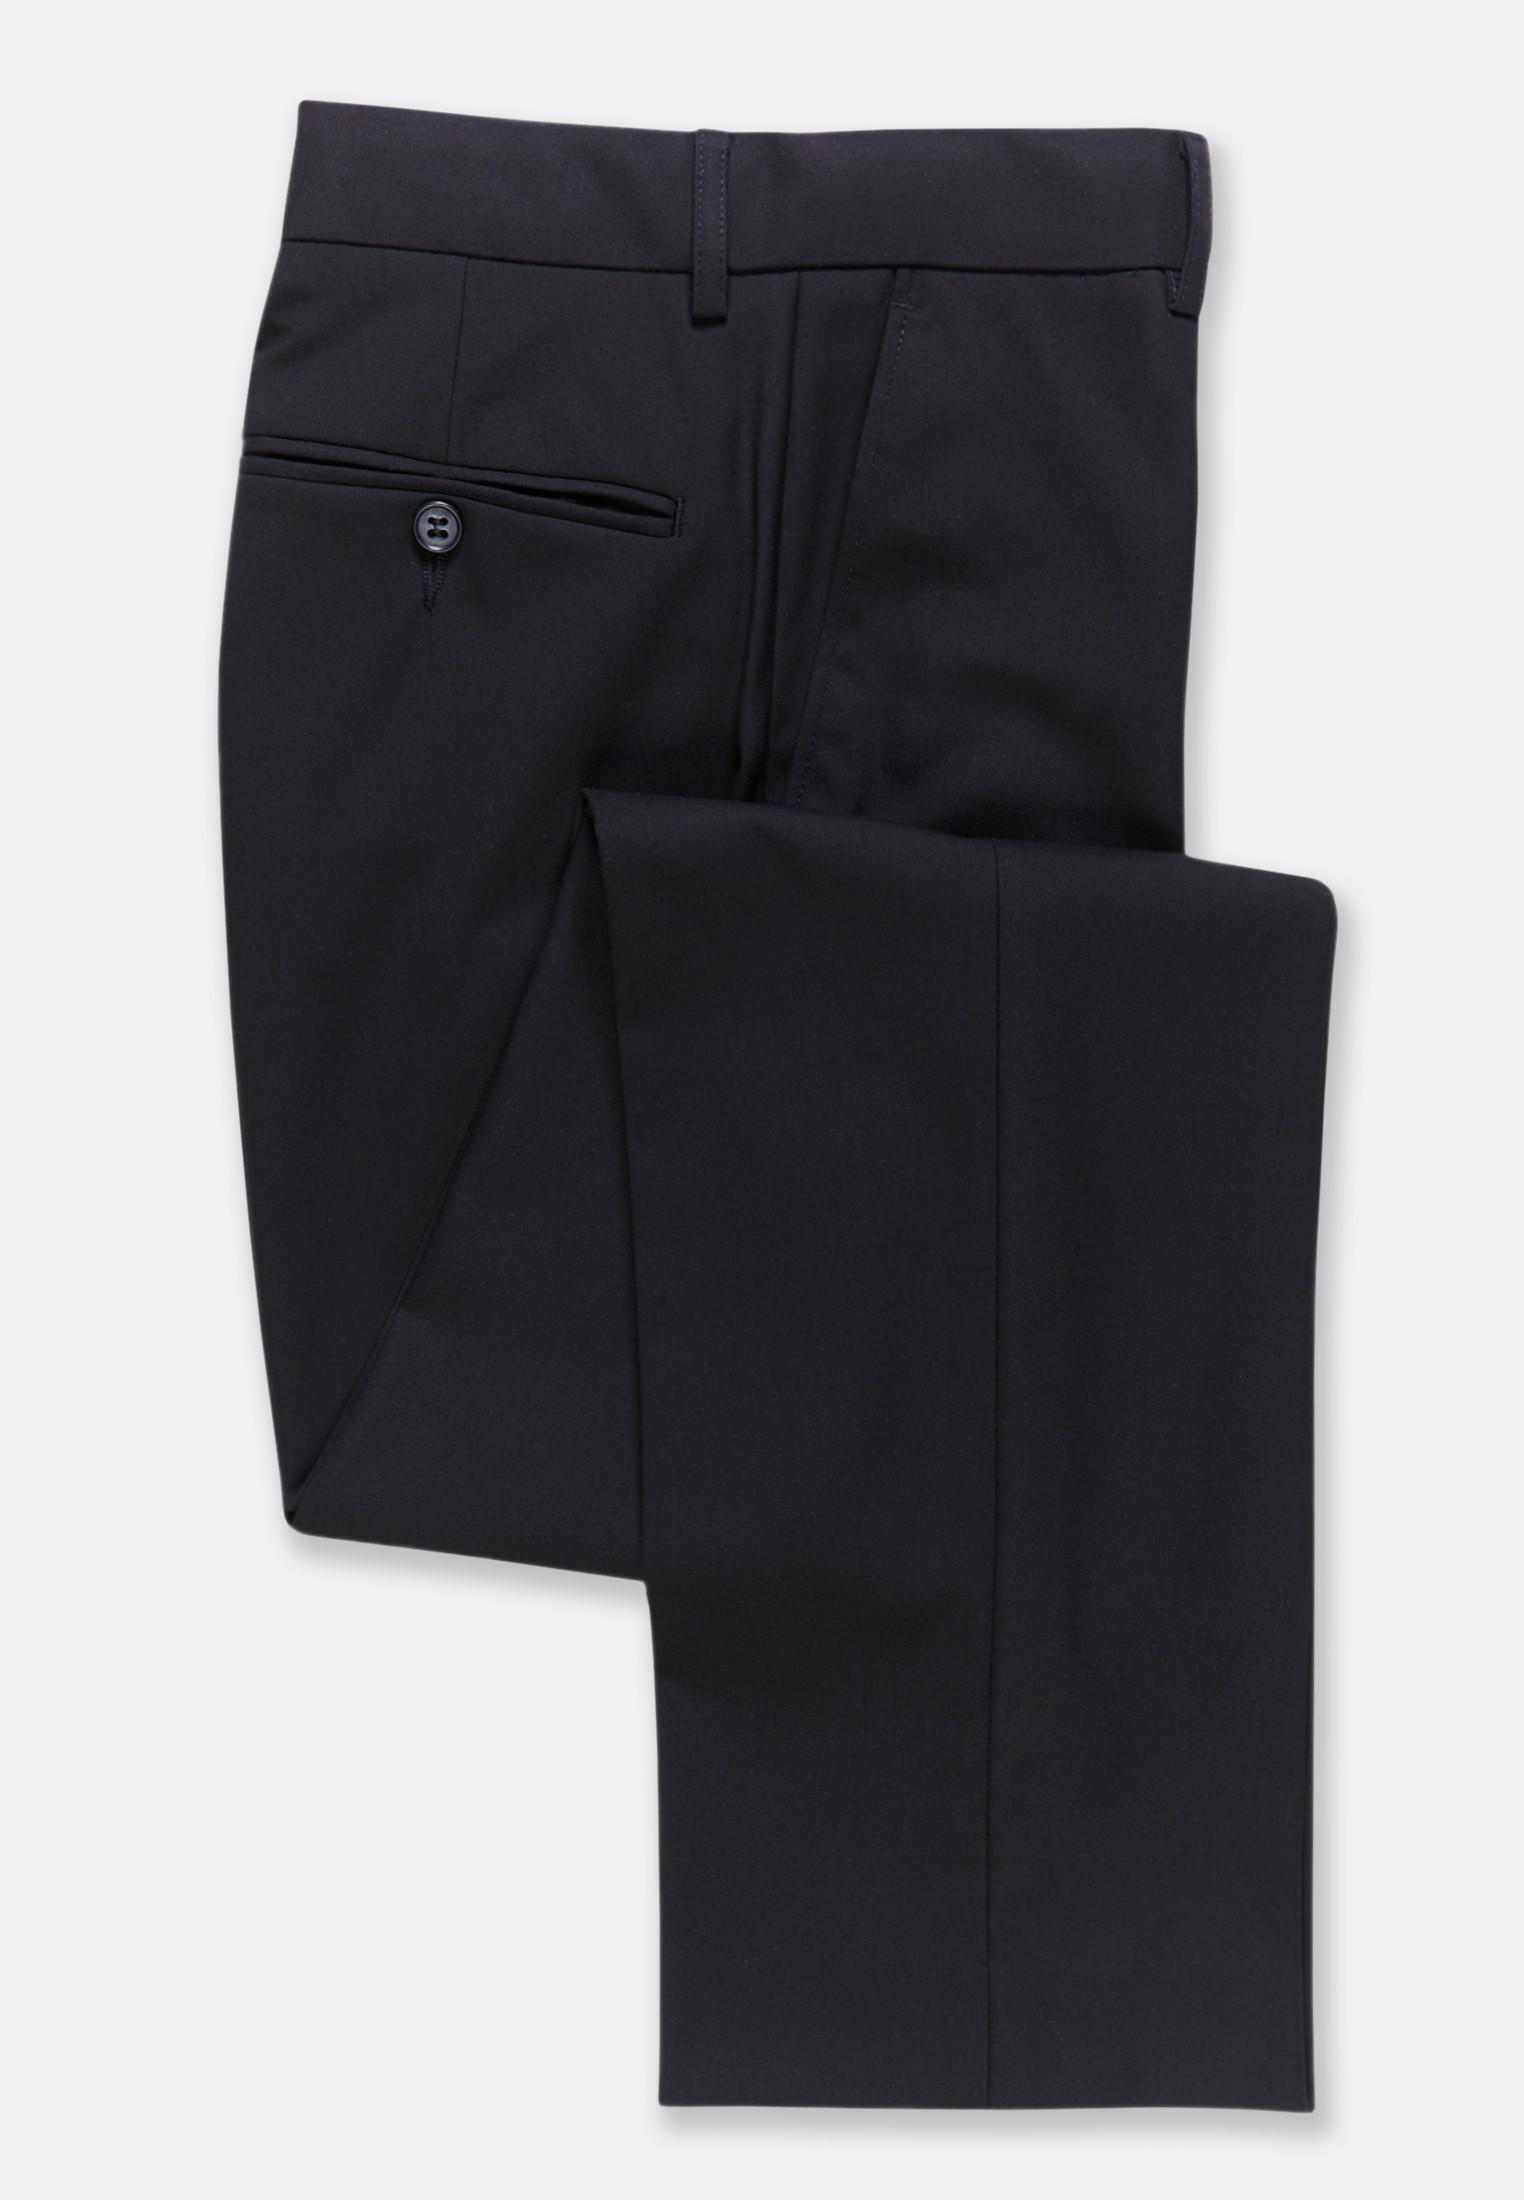 Monaco Black Tailored Fit Trouser